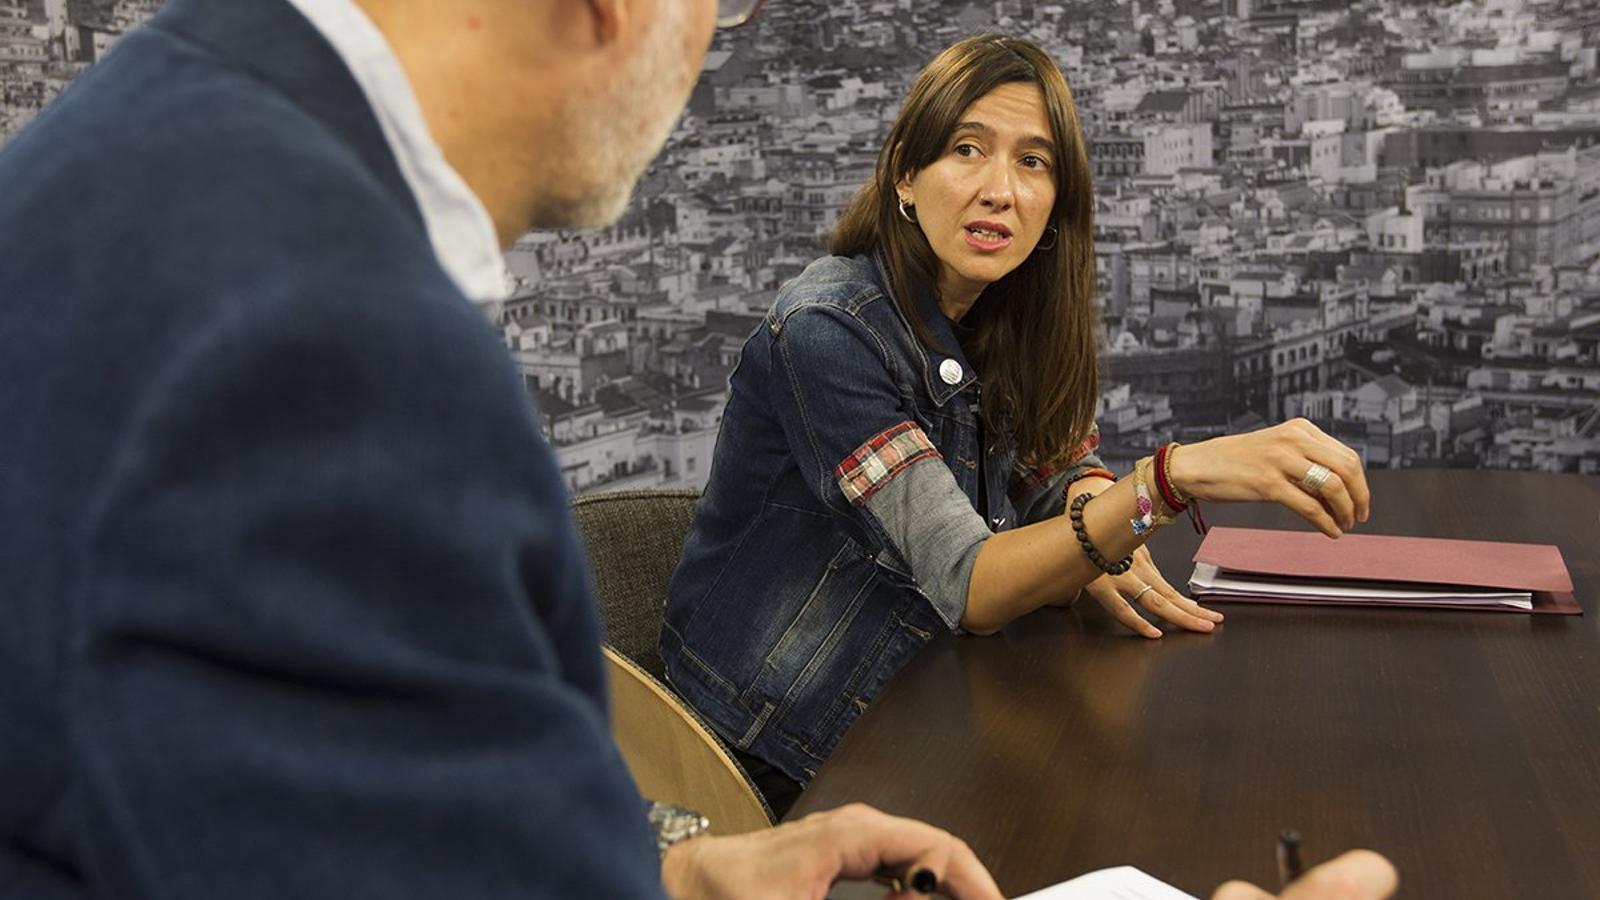 Entrevista d'Antoni Bassas a Núria Parlon